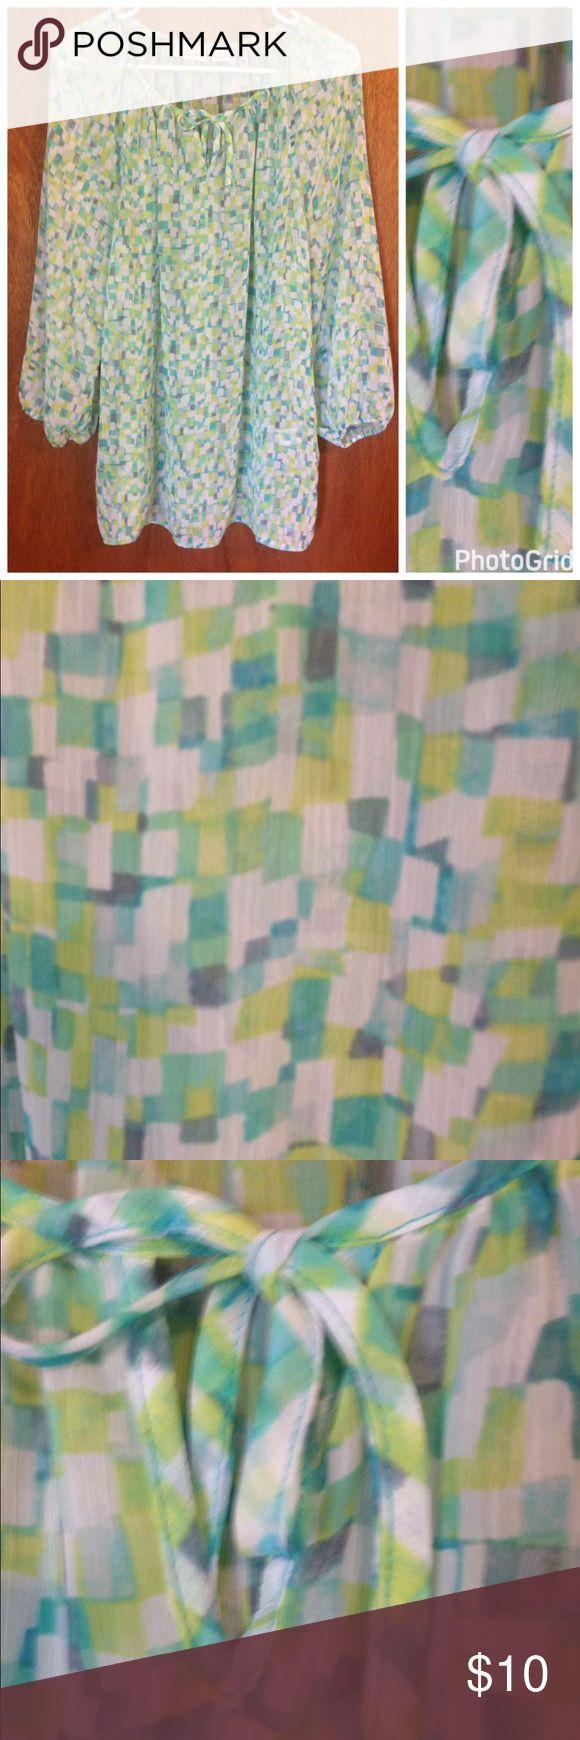 Sheer blouse by Liz Claiborne size XL Pretty sheer blouse by Liz Claiborne size XL Liz Claiborne Tops Blouses